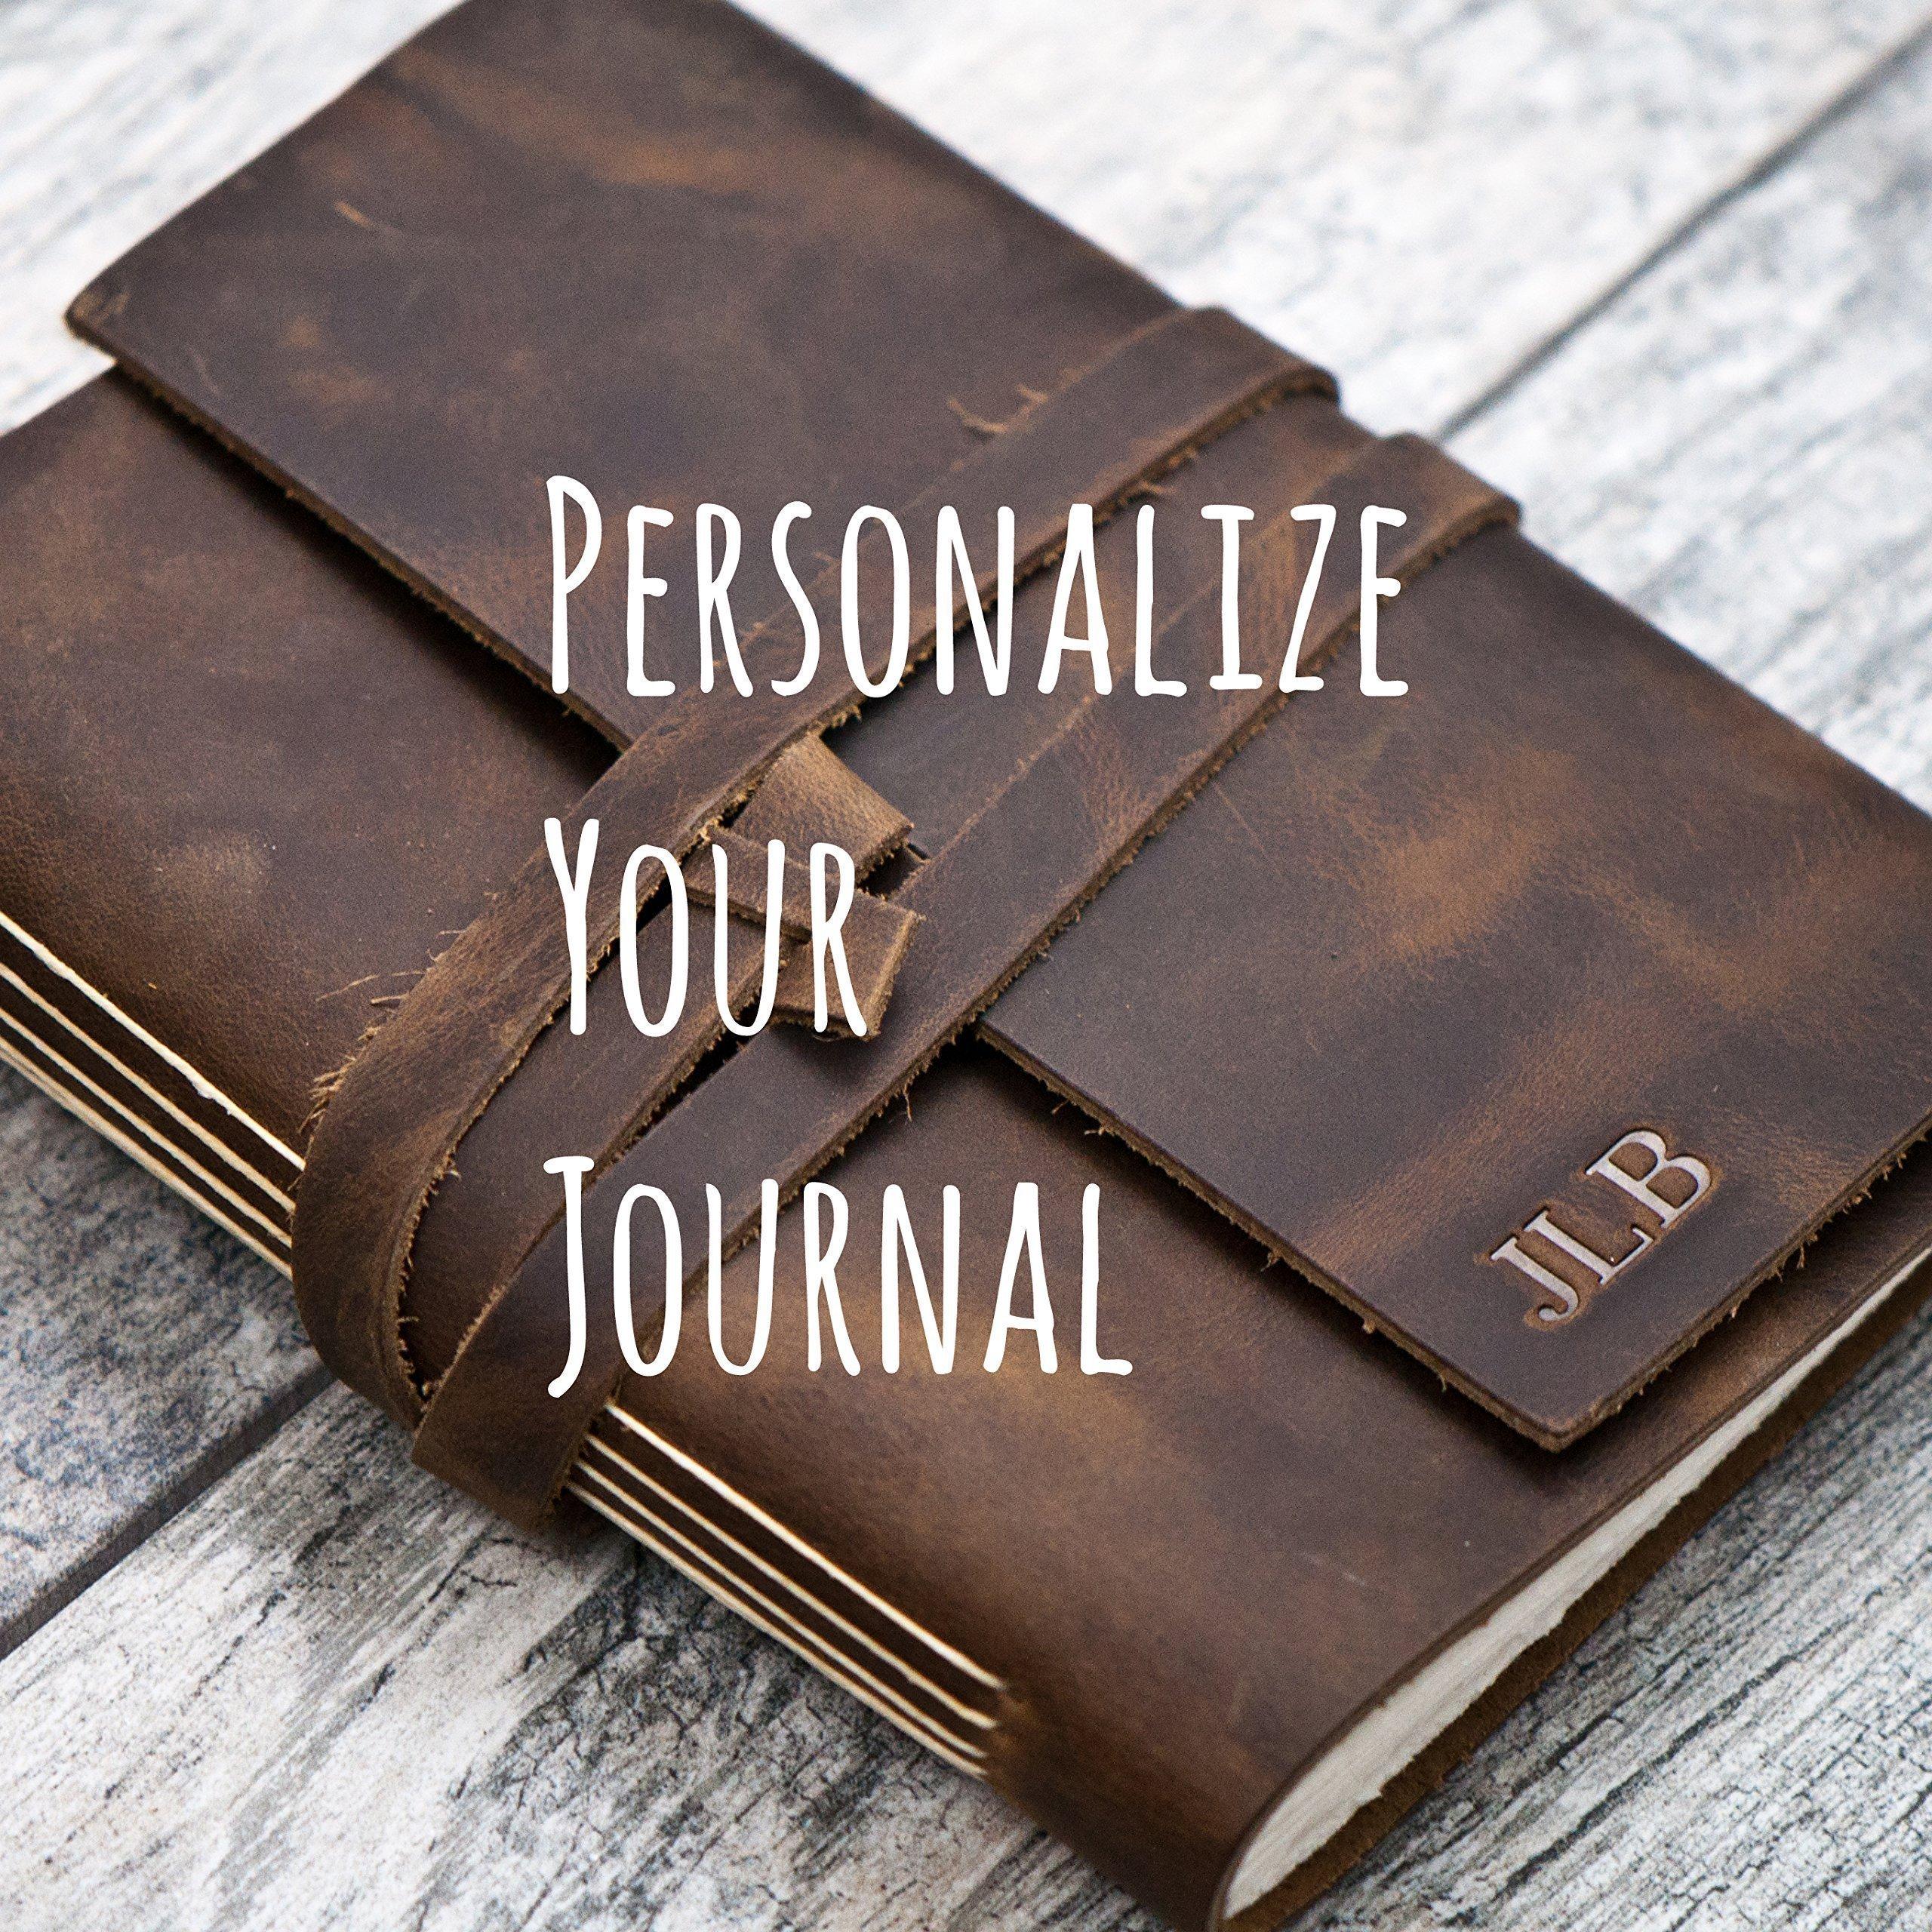 Personalized Leather Journal Notebook or Sketchbook | Rustic Brown, Saddle Tan, Dark Brown